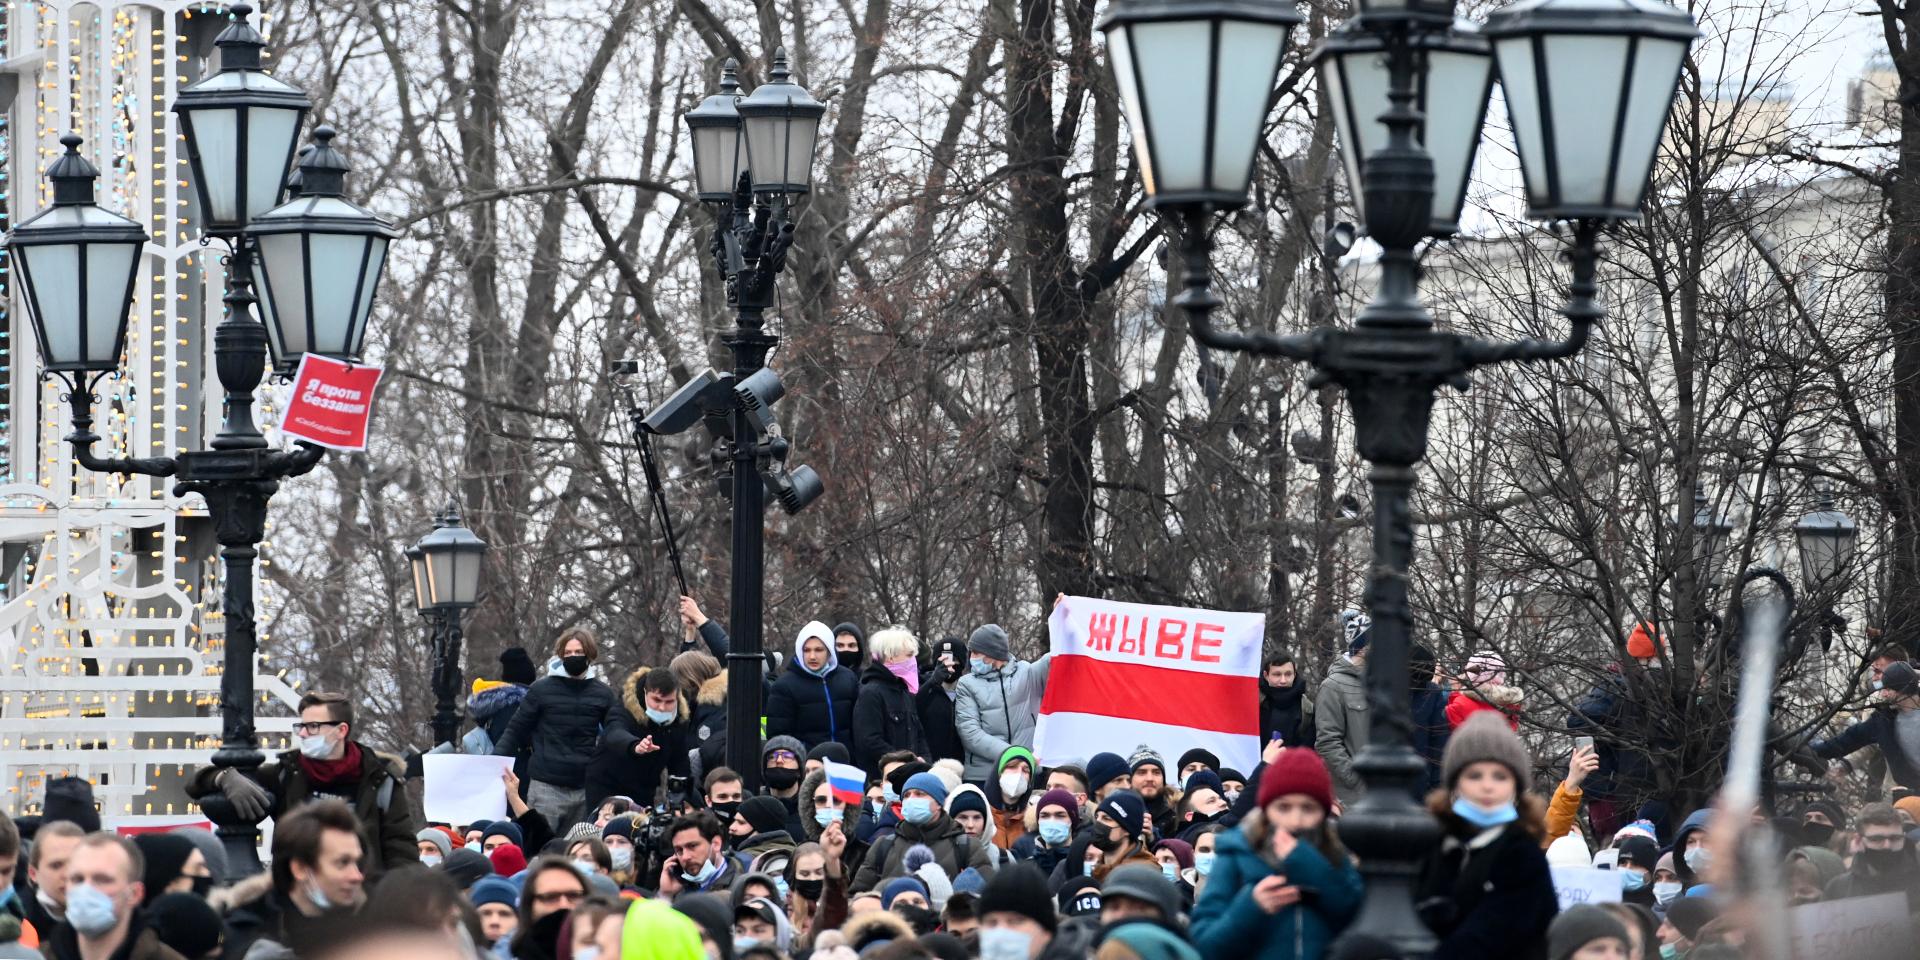 Russie : heurts et interpellations lors de manifestations en soutien à Alexeï Navalny